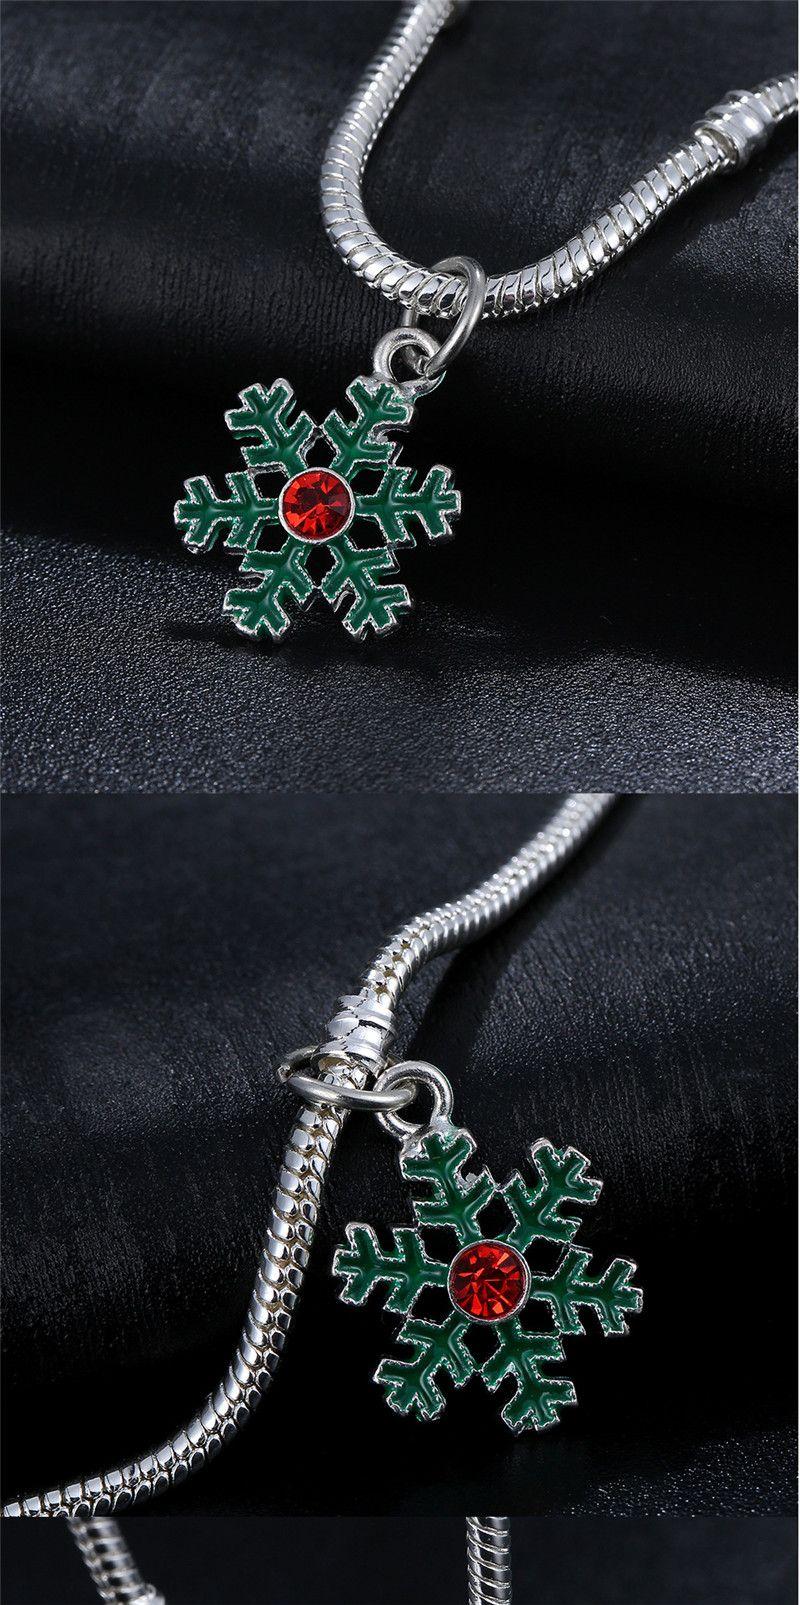 Christmas festival beads hanging Green snowflake pendant European Charms fit Pandora Snake Chain Bracelets Wholesale Charm Jewelry